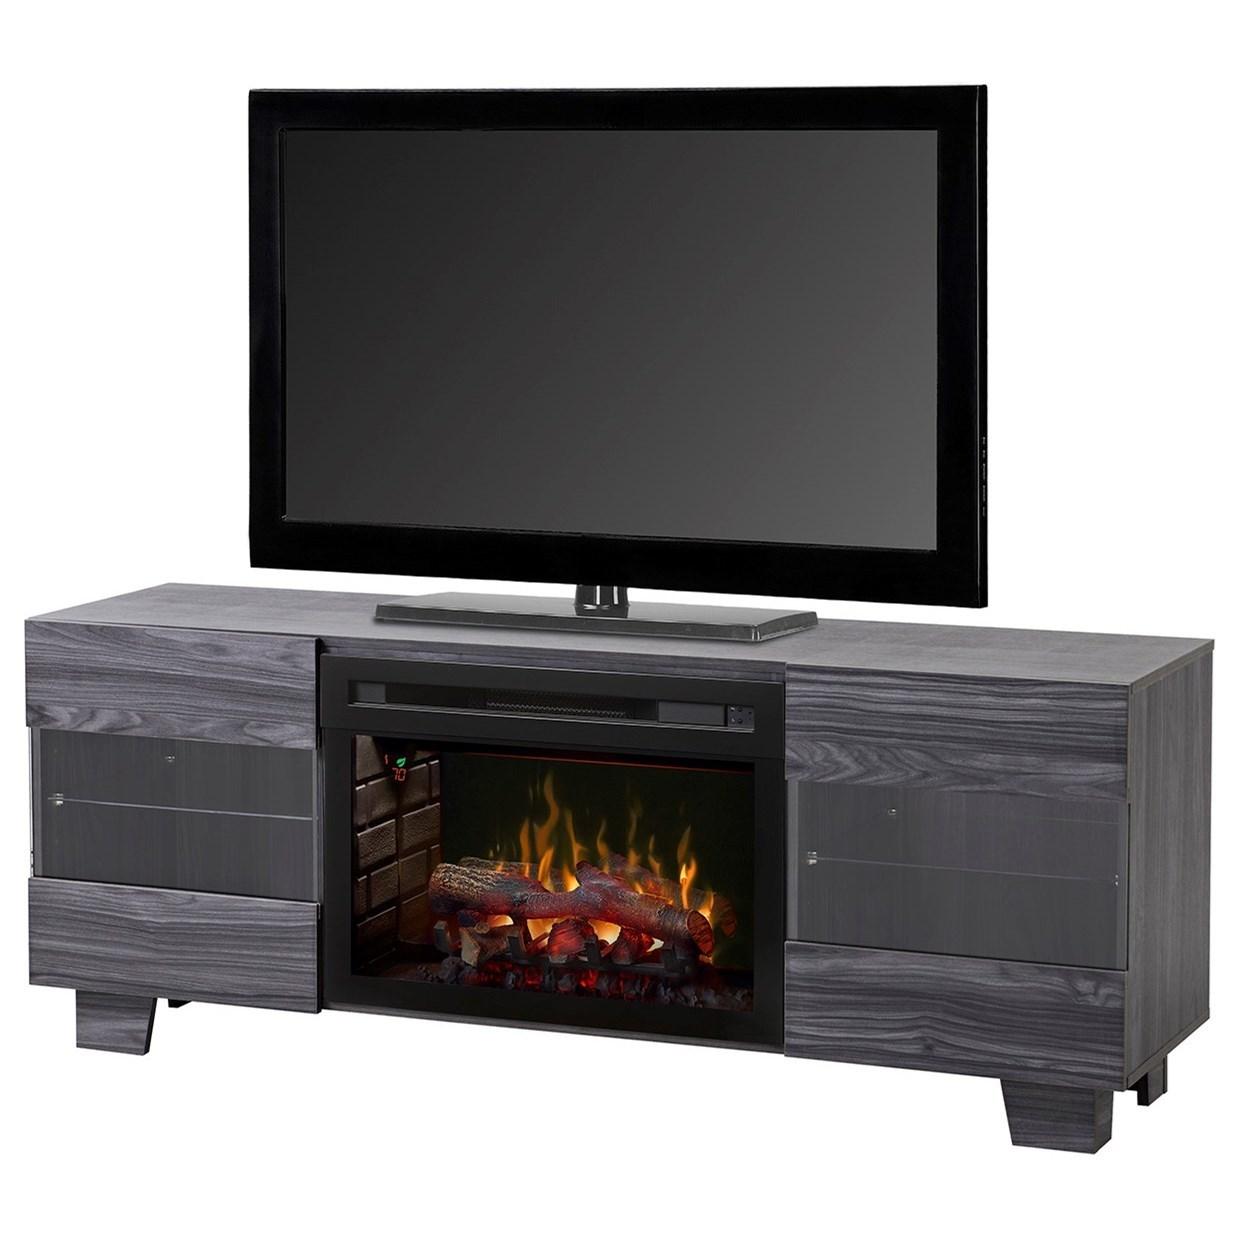 Max Media Mantel Fireplace